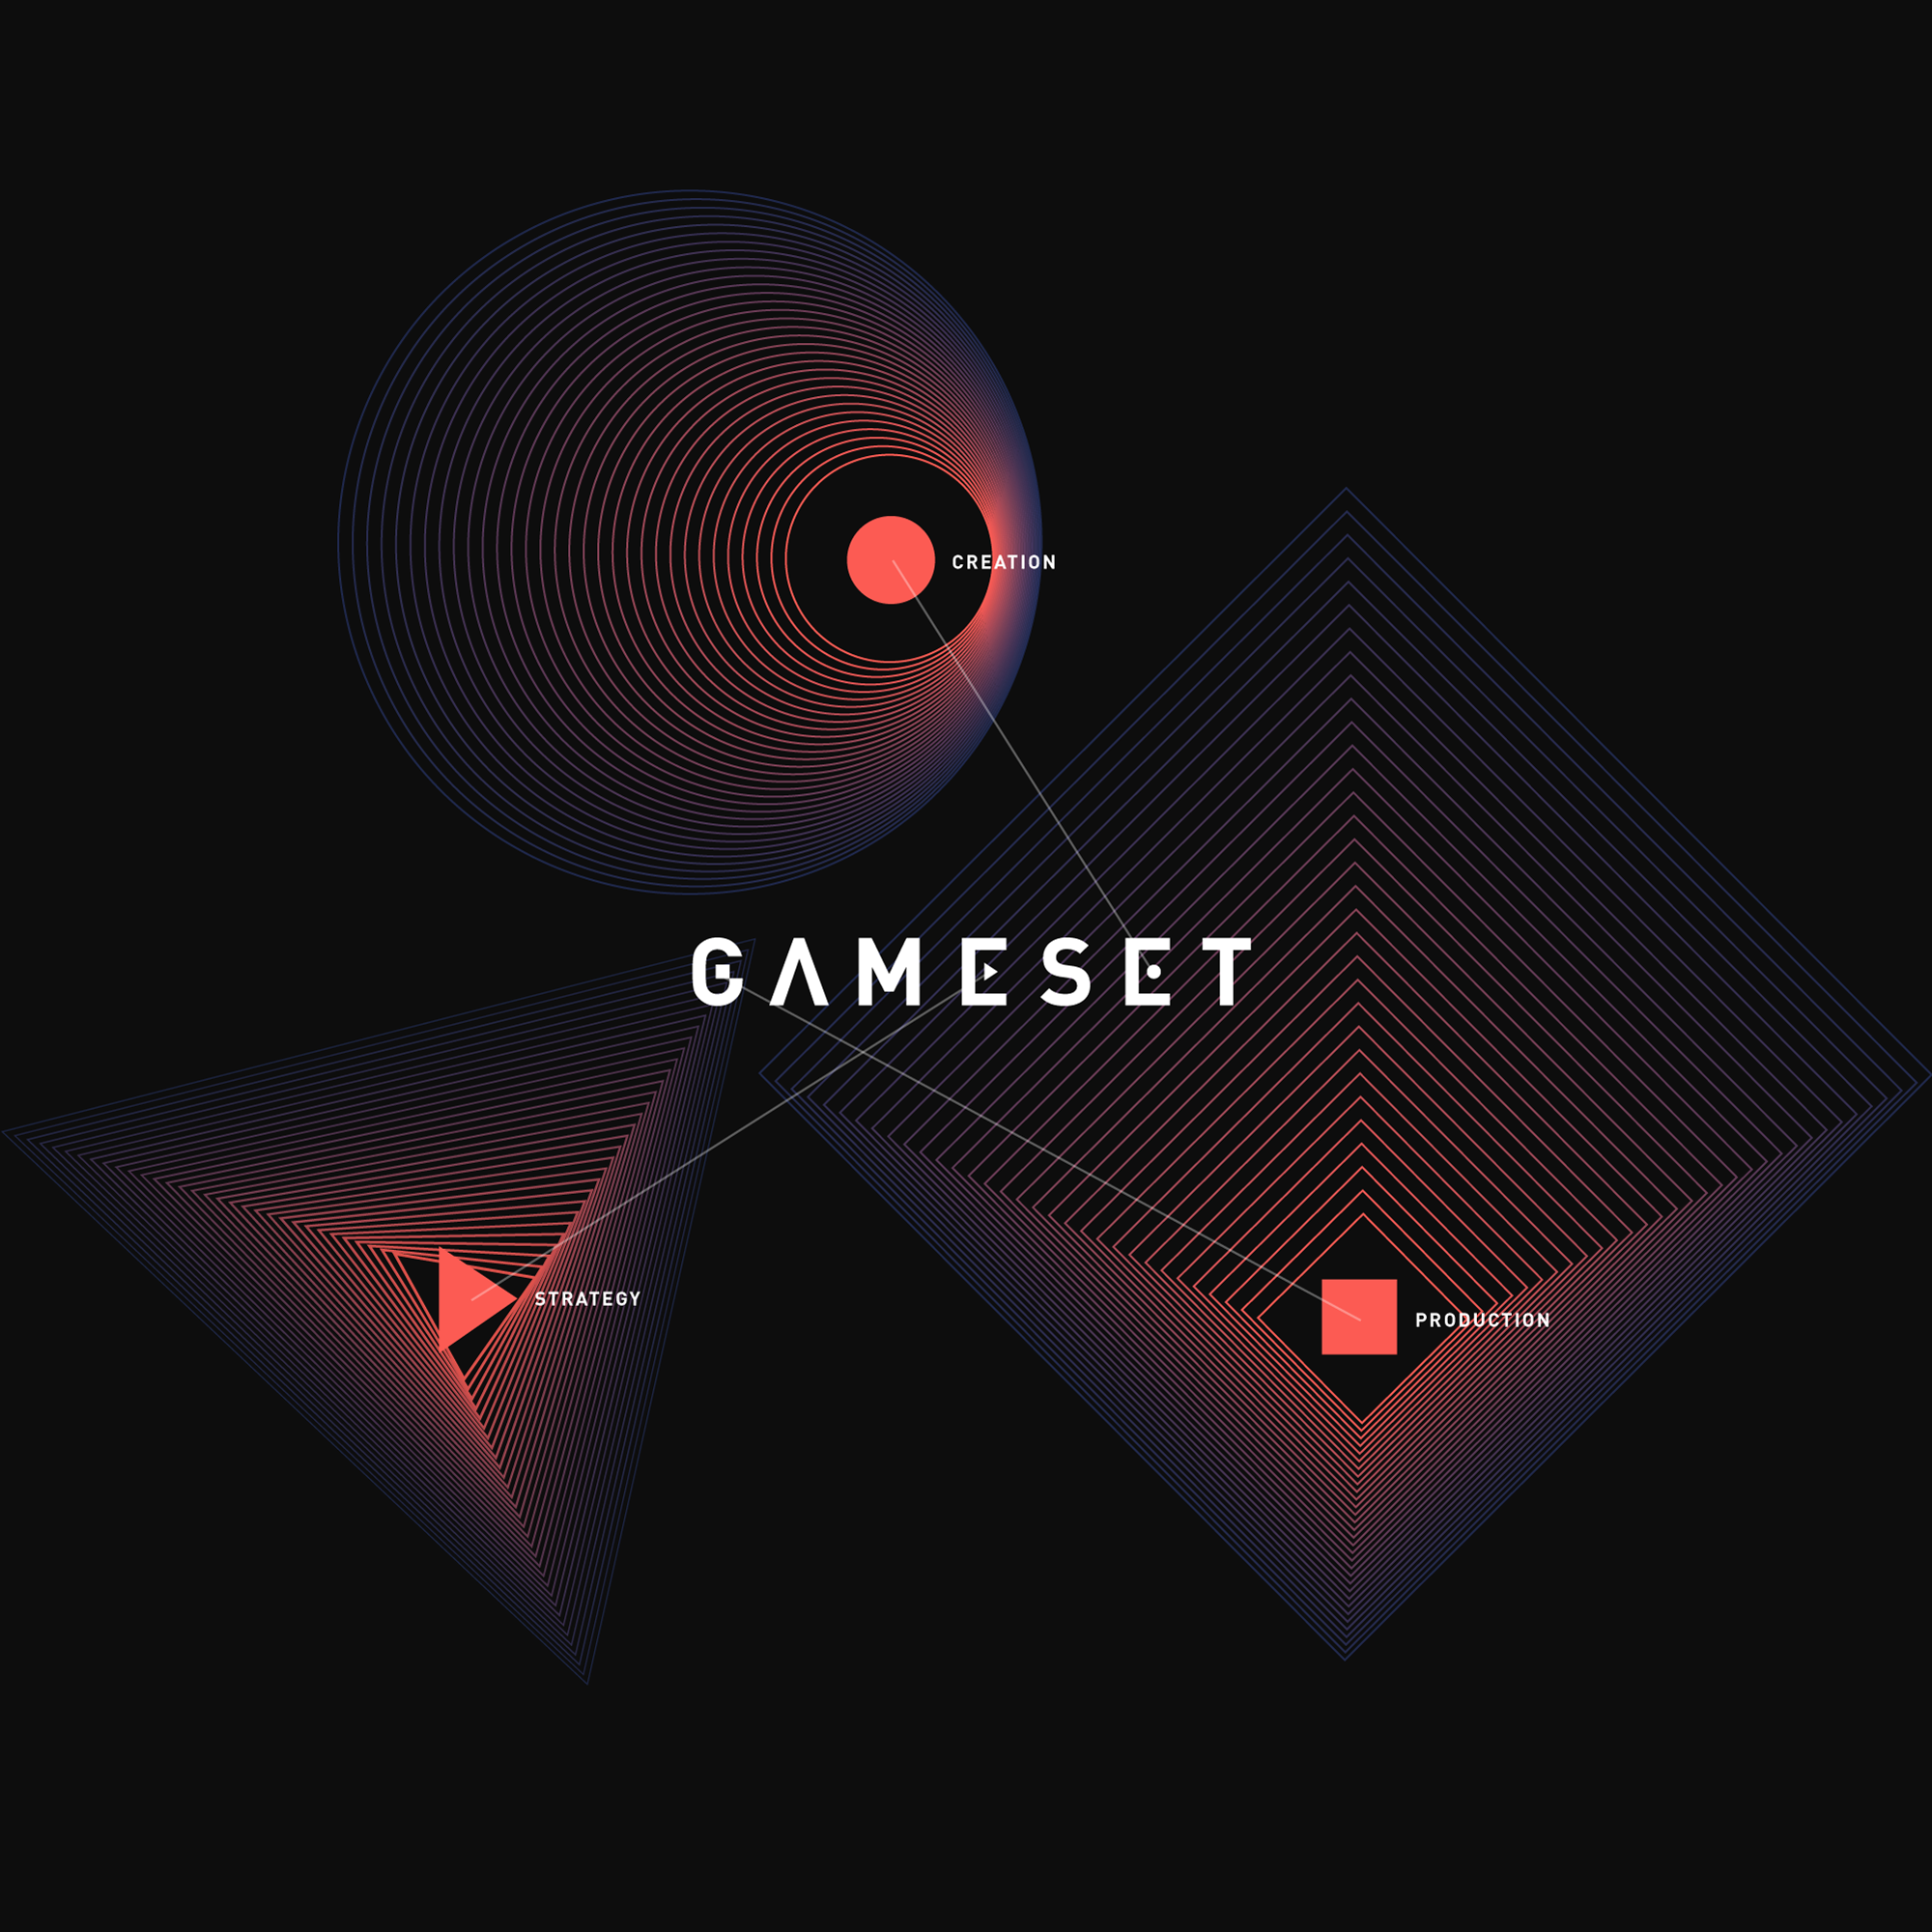 GAMESET3